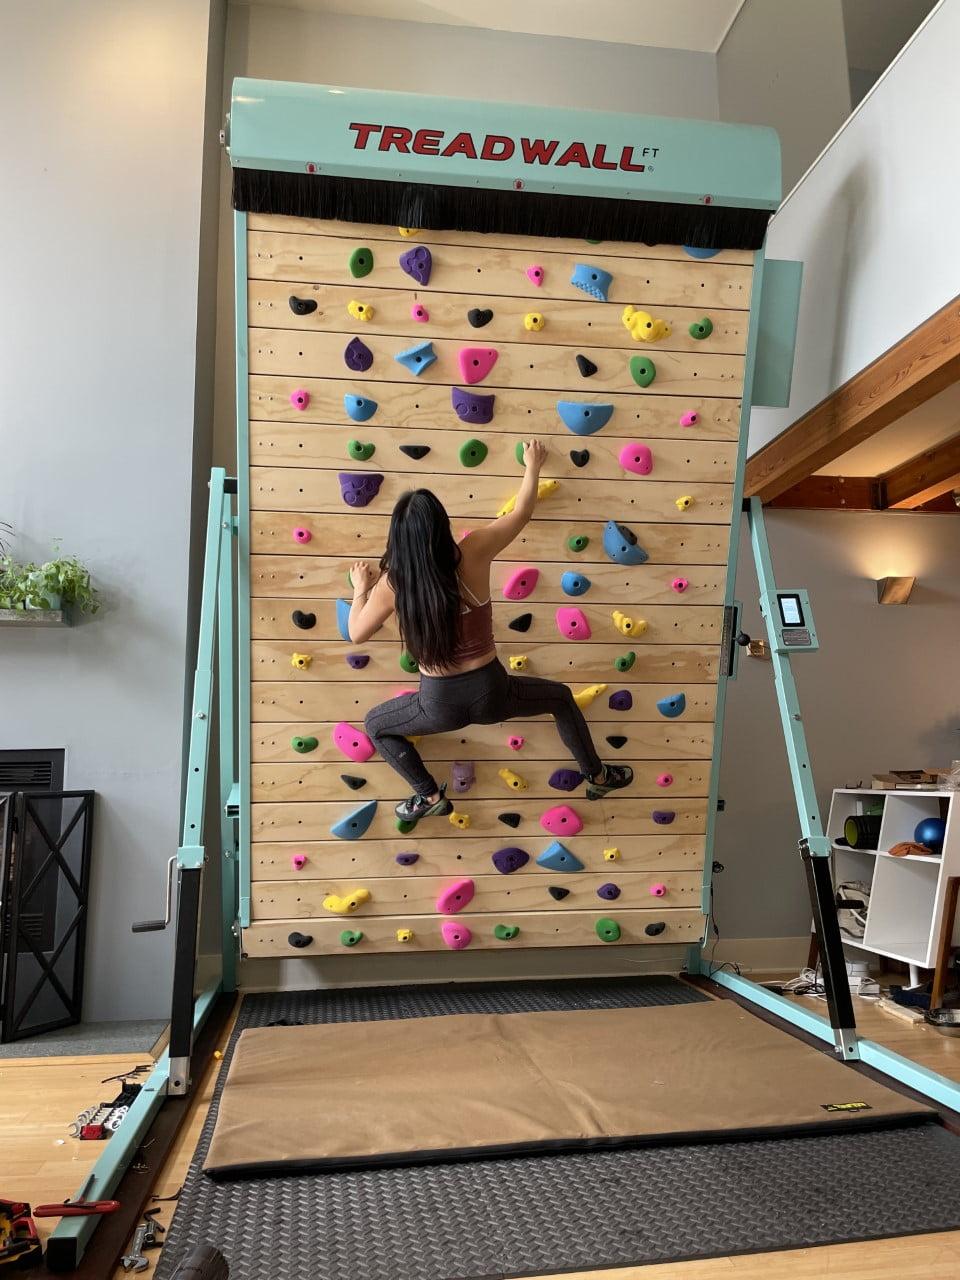 Kore, Climbing simulators, Fitness climbing, Functional climbing, Endless climbing wall, home fitness climbing wall, commercial climbing walls